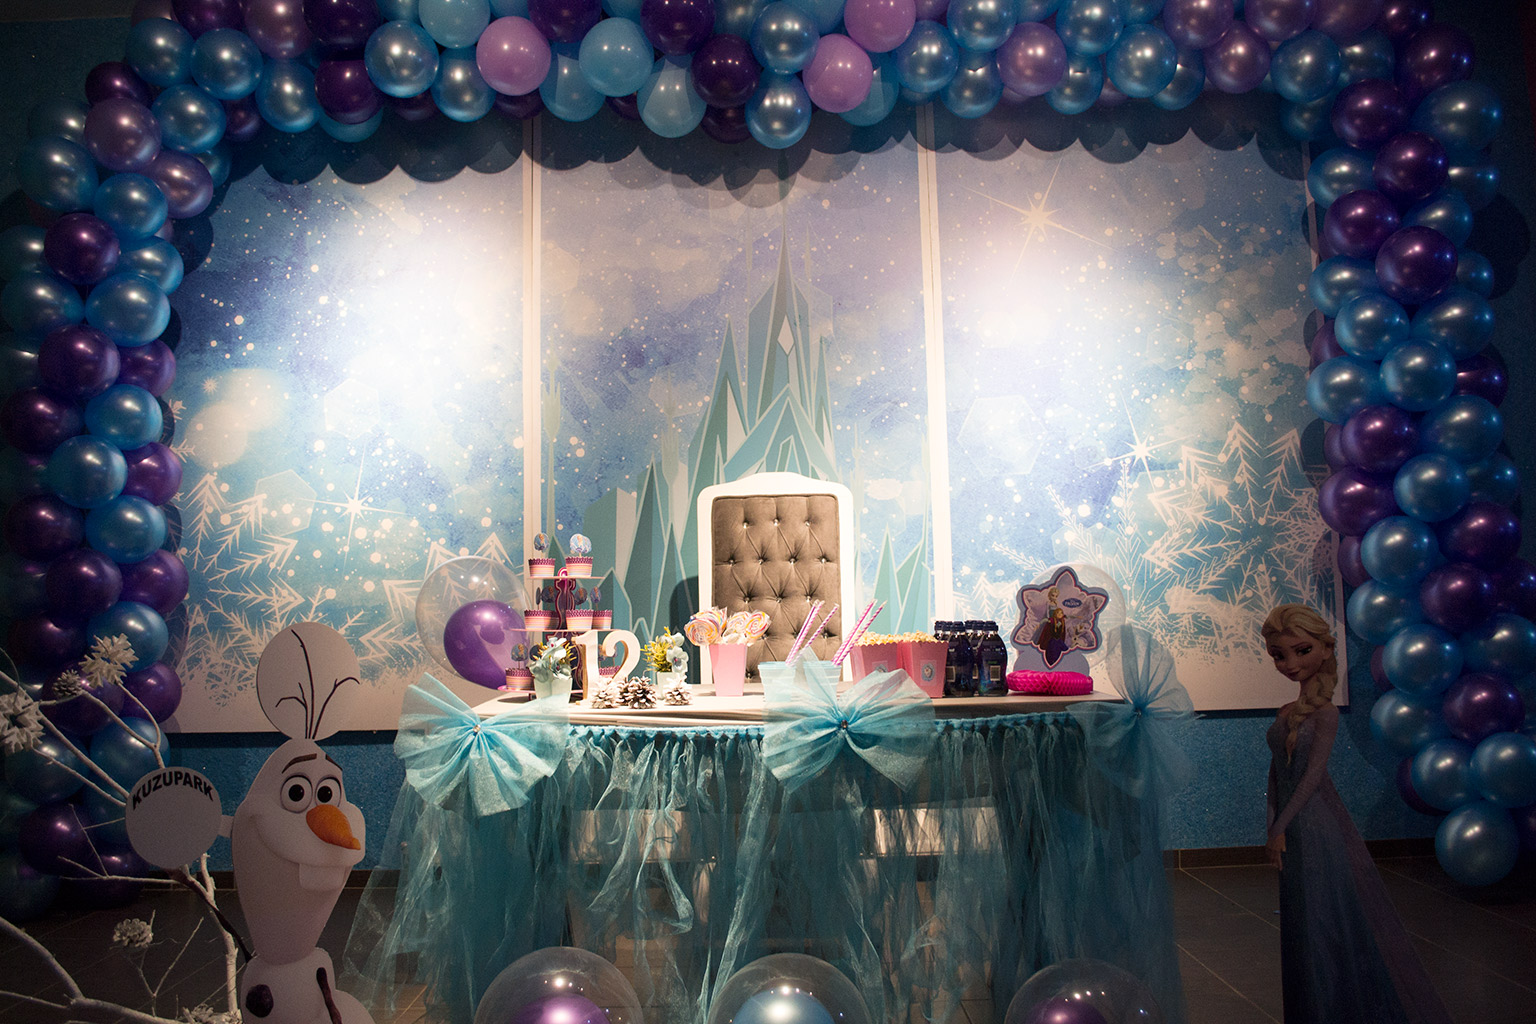 Kuzupark Elsa Doğum Günü Konsepti